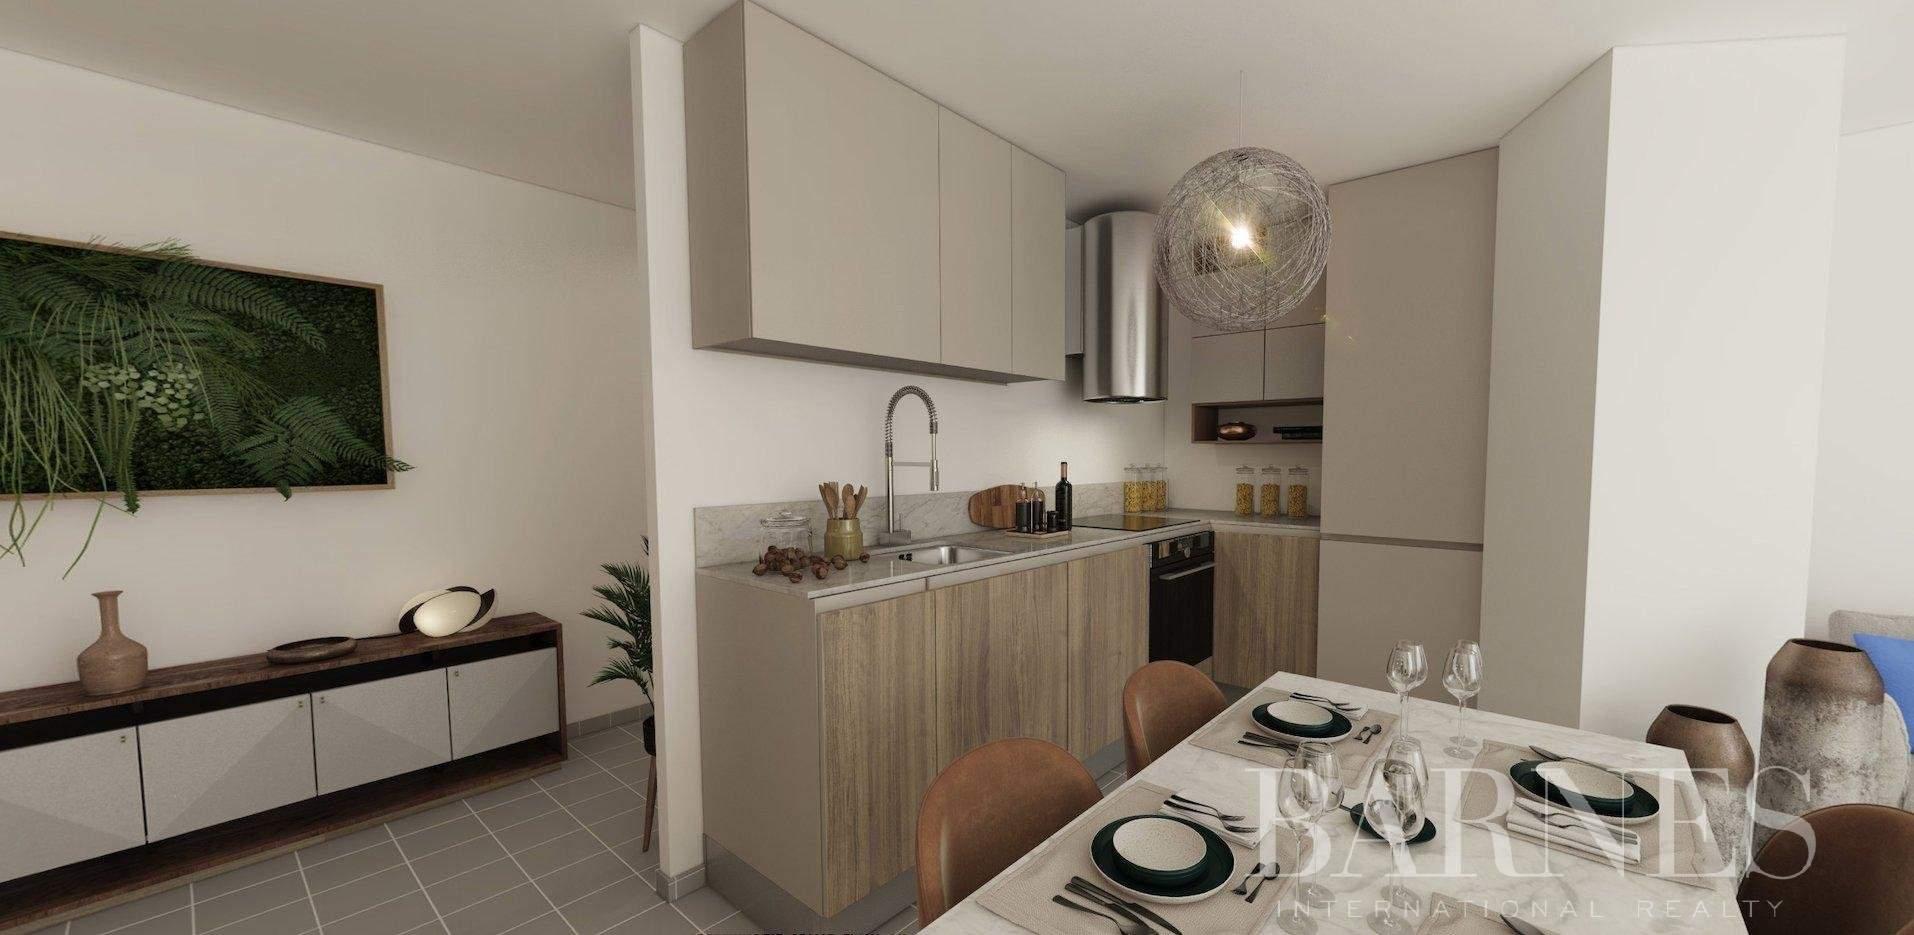 Grasse  - Appartement 3 Pièces 2 Chambres - picture 4